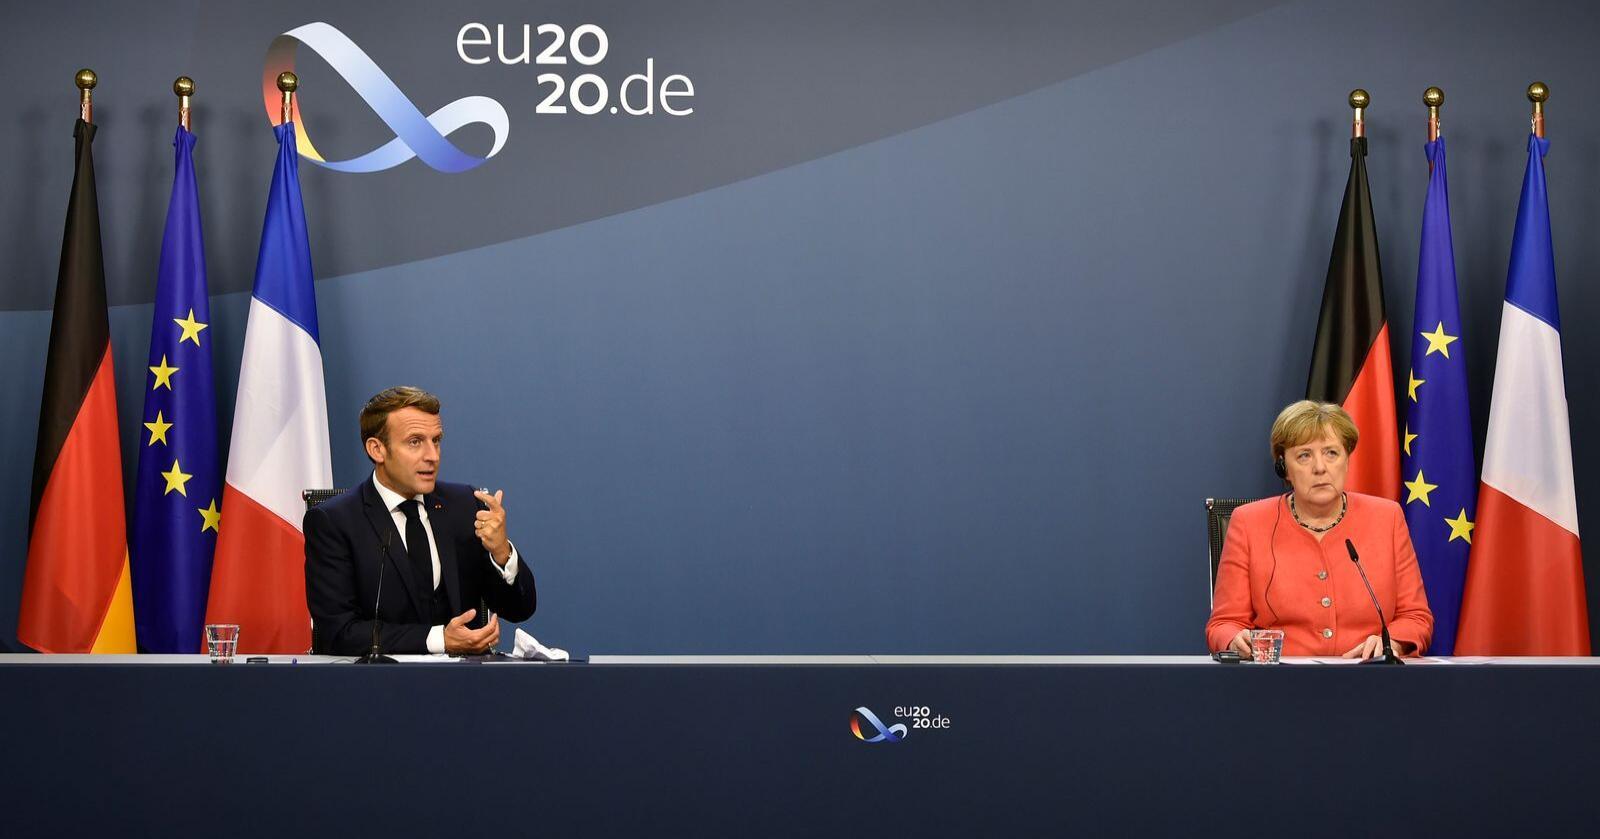 Korona: Tysklands Rikskanseler Angela Merkel og den franske presidenten Emmanuel Macron la fram en korona-krisepakke tirsdag 21. juli. Foto: John Thys / AP / NTB scanpix